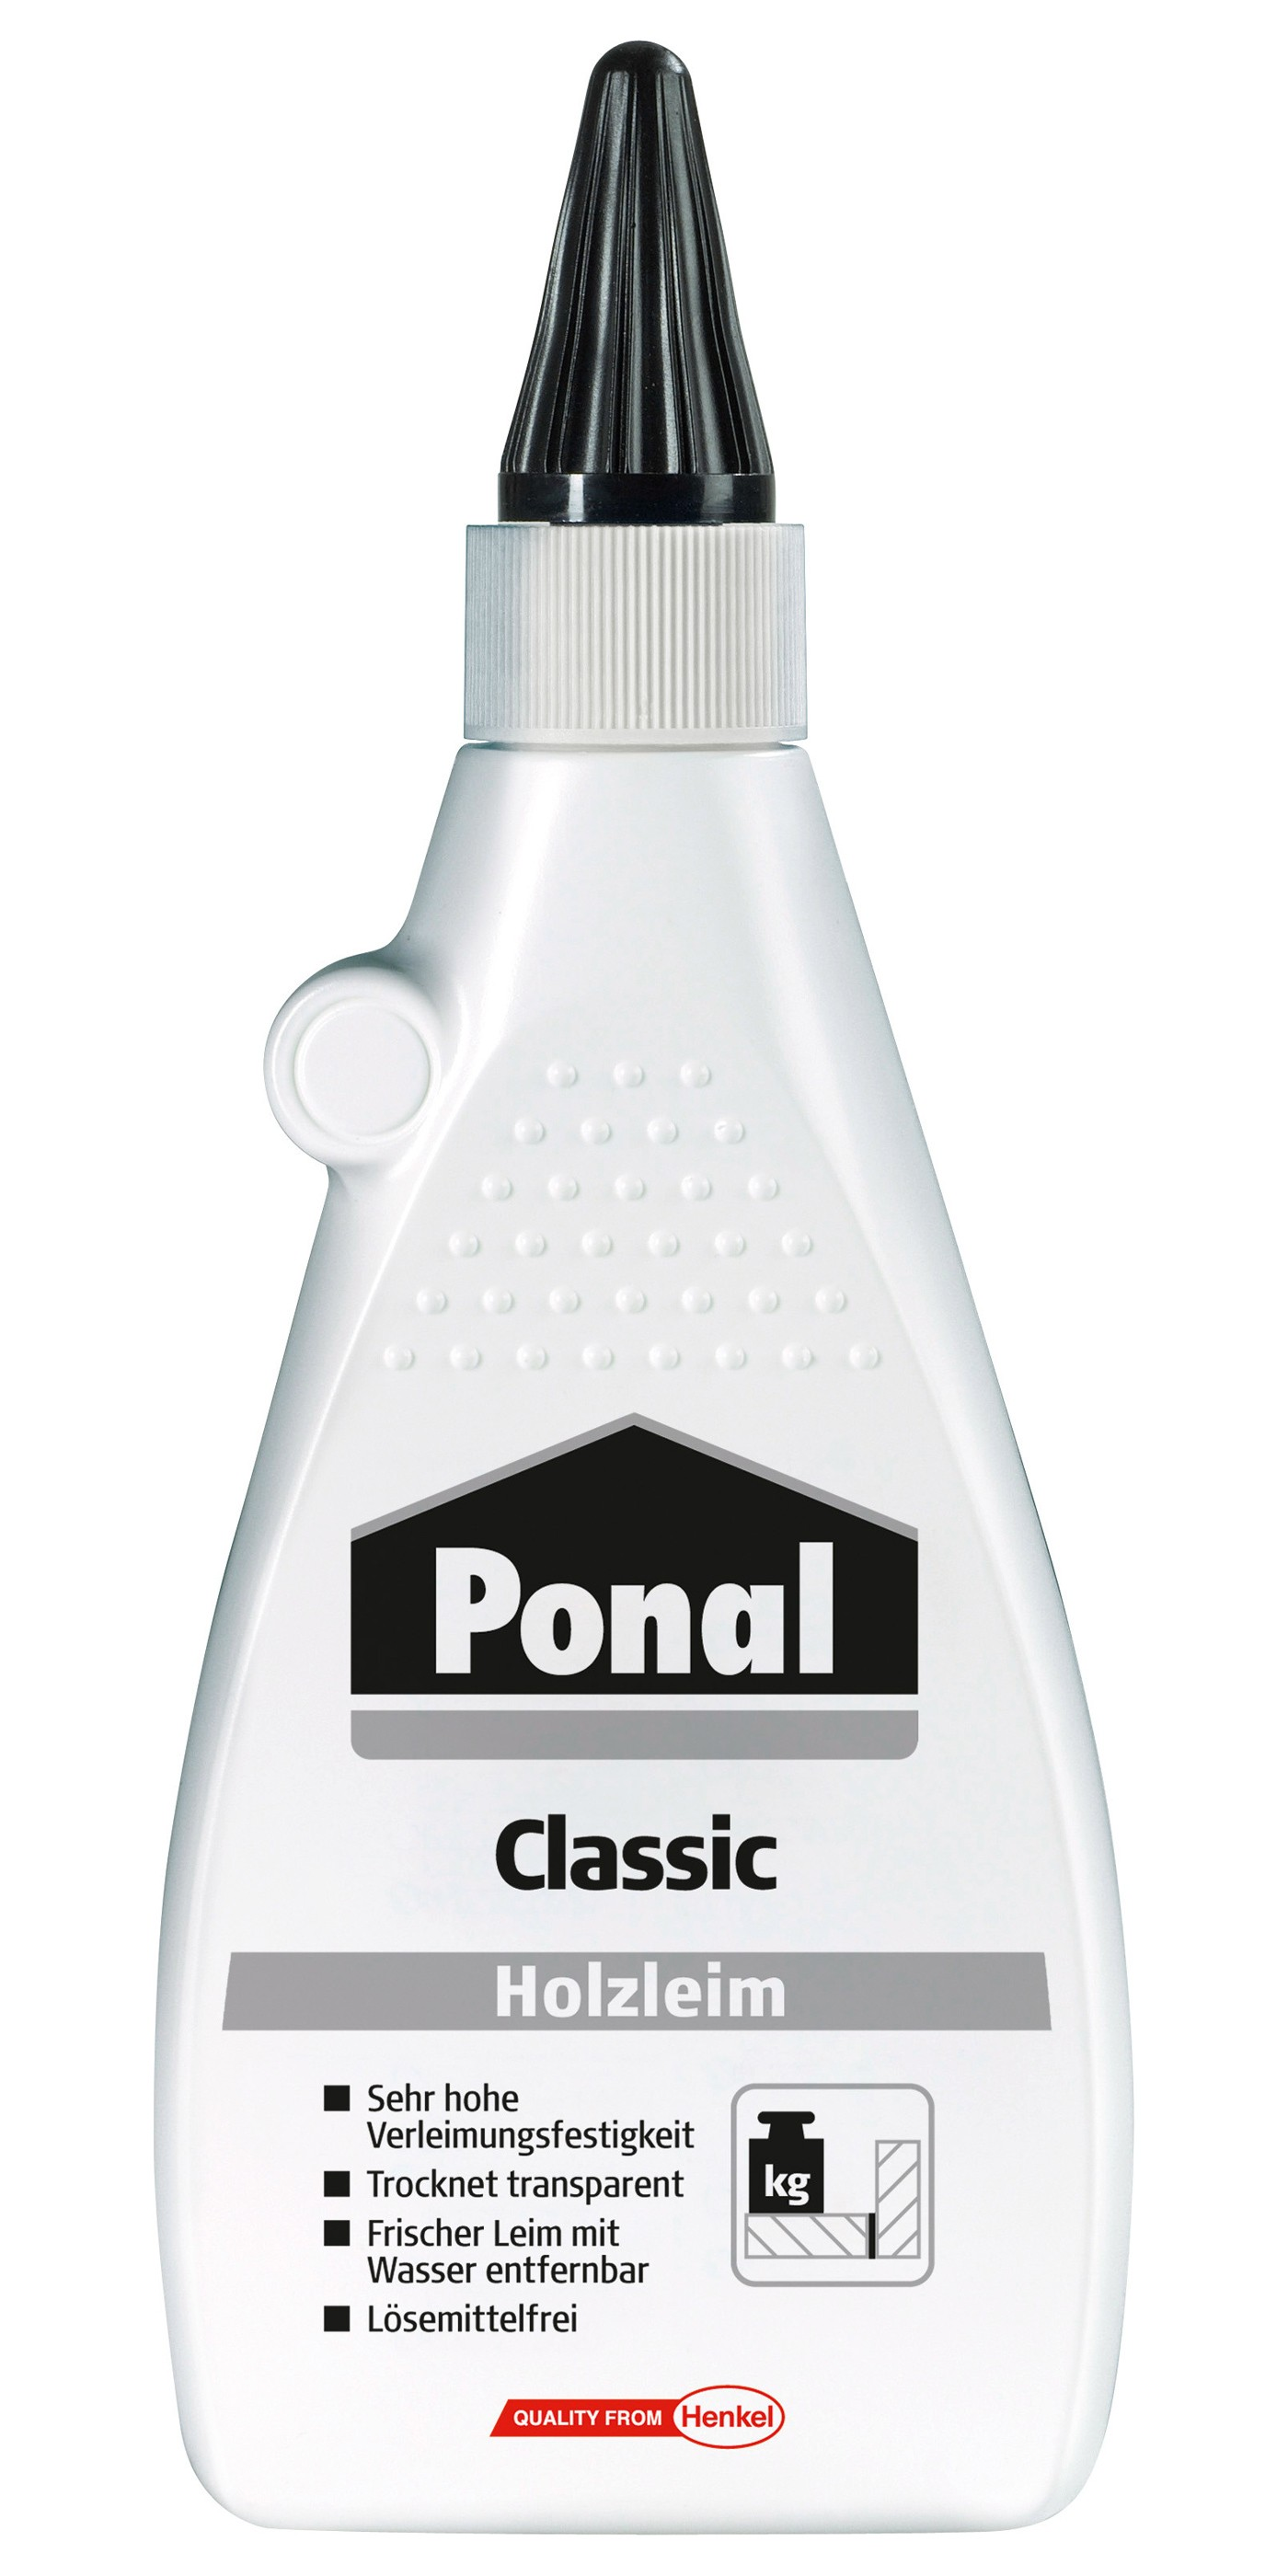 Ponal Classic Holzleim 550g Bild 1